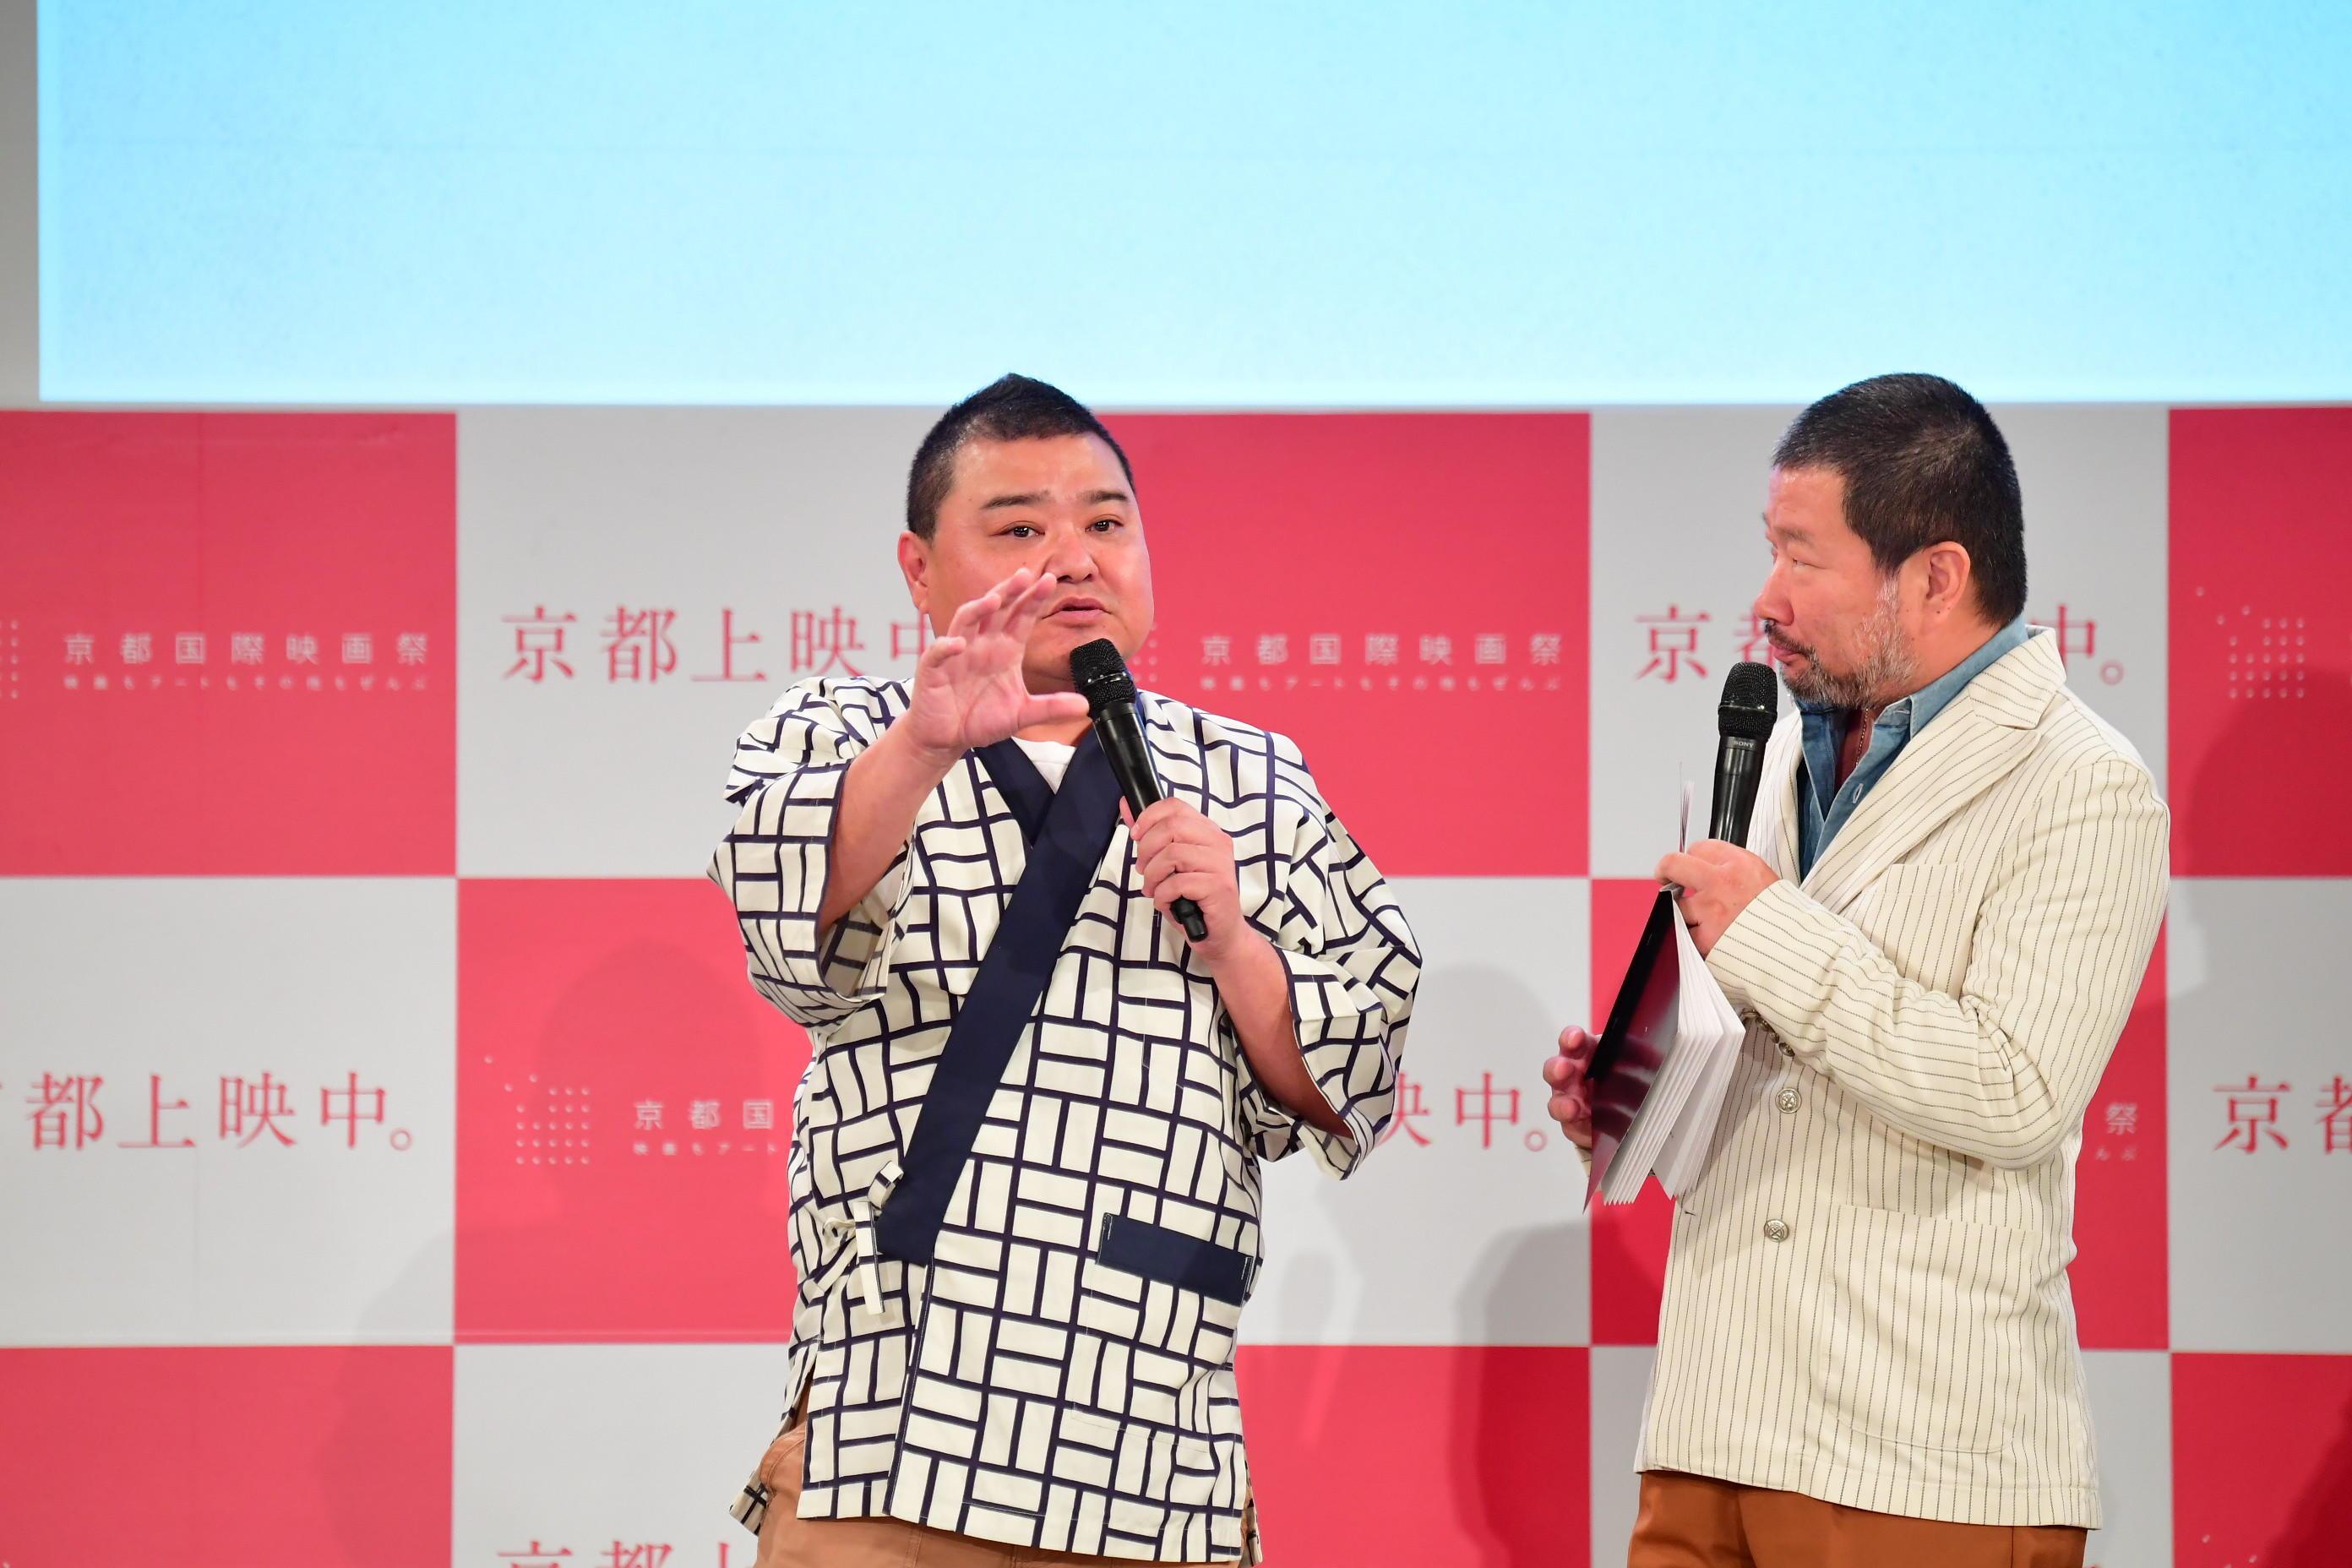 http://news.yoshimoto.co.jp/20180903233906-a75d27649928a9a6fd738f1c6f89d7425b305533.jpg